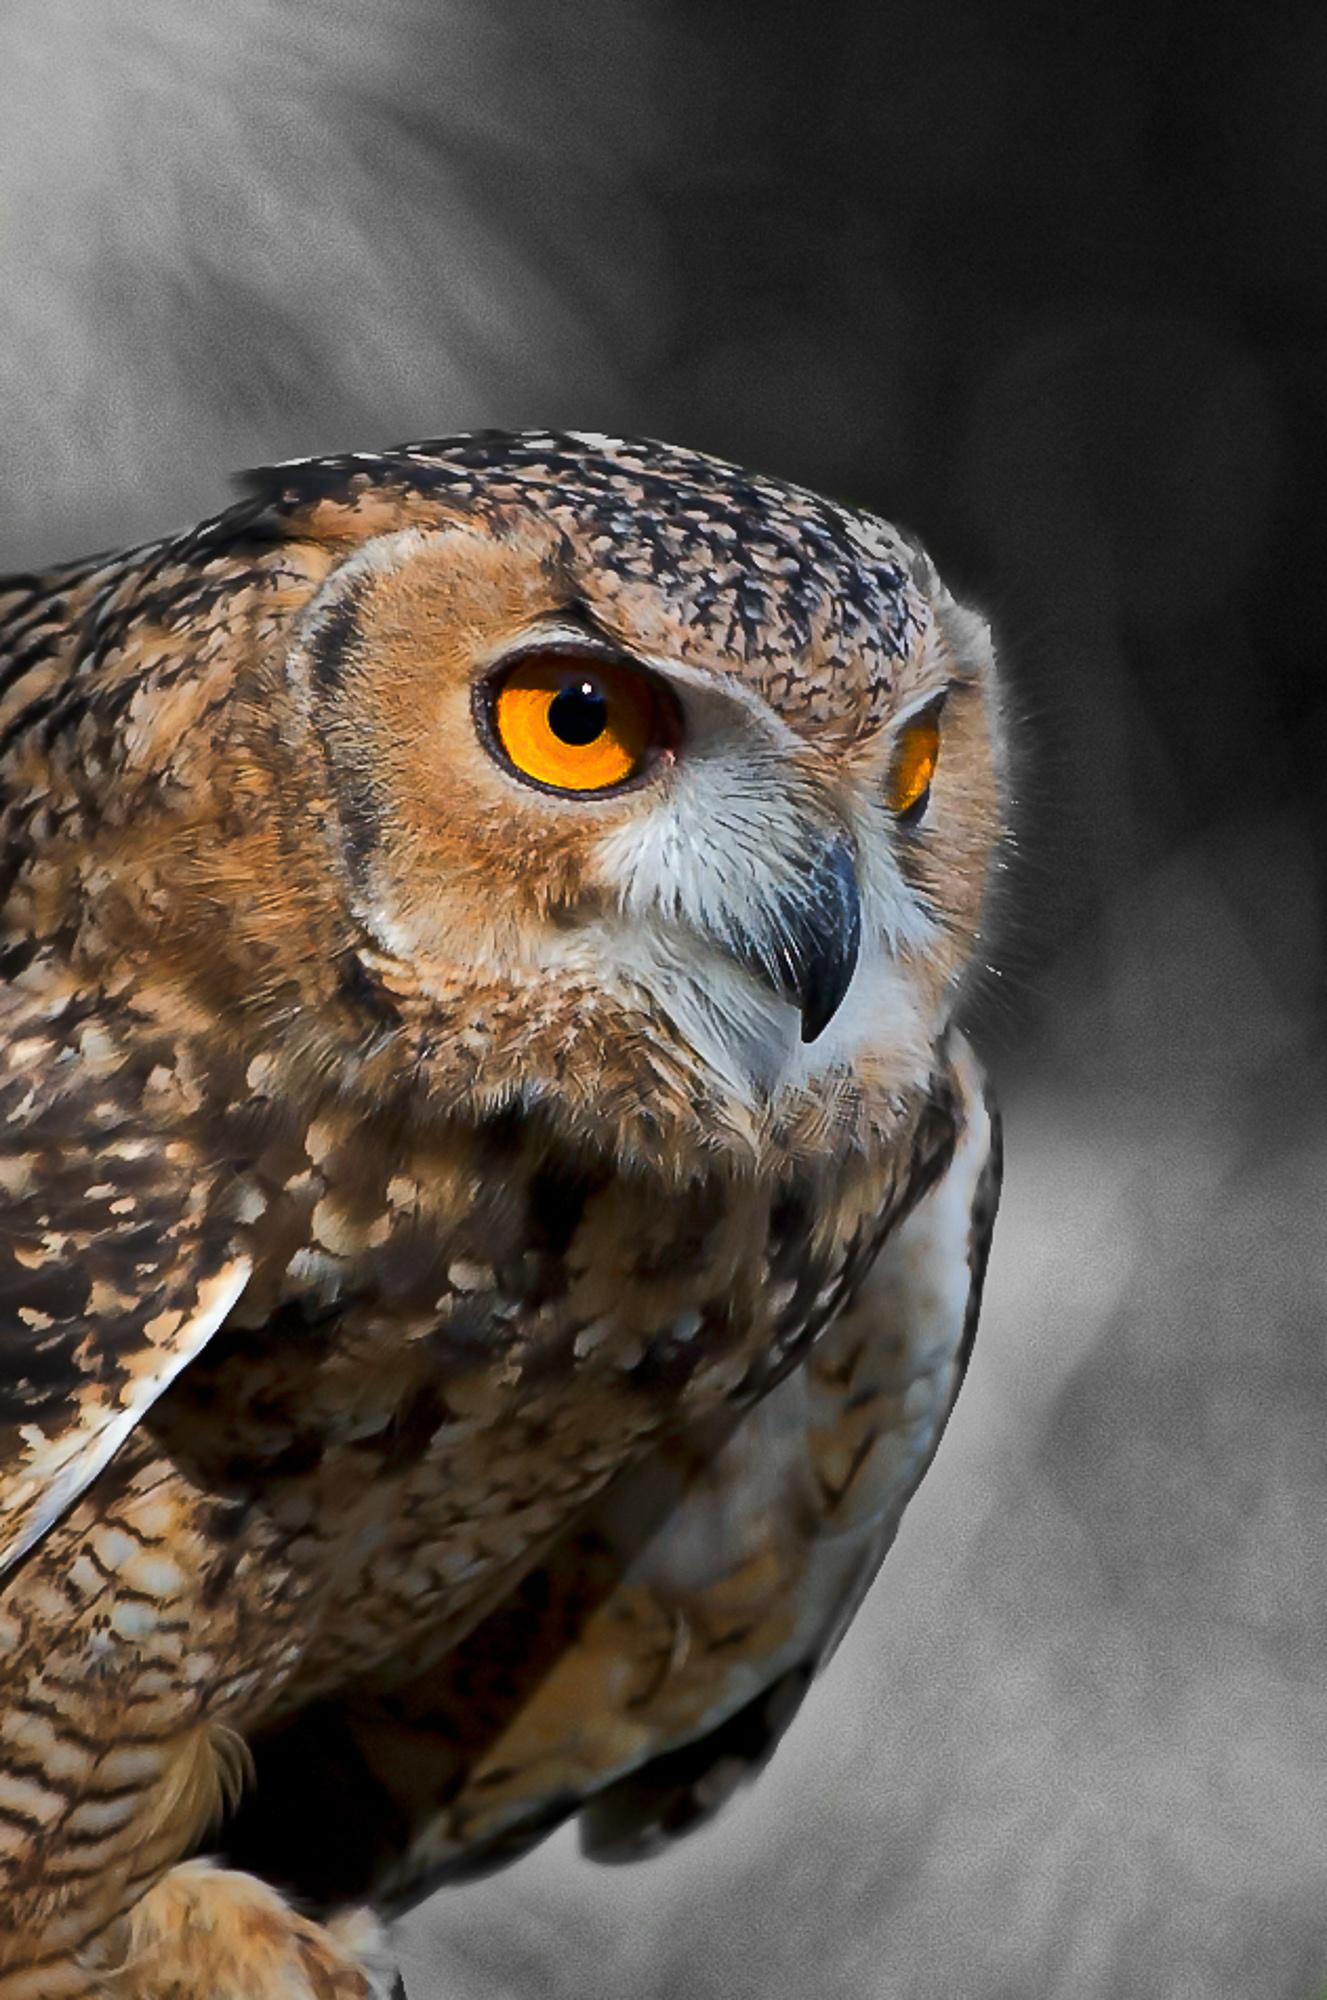 2014-10-18_Birds_Booker_0762.jpg